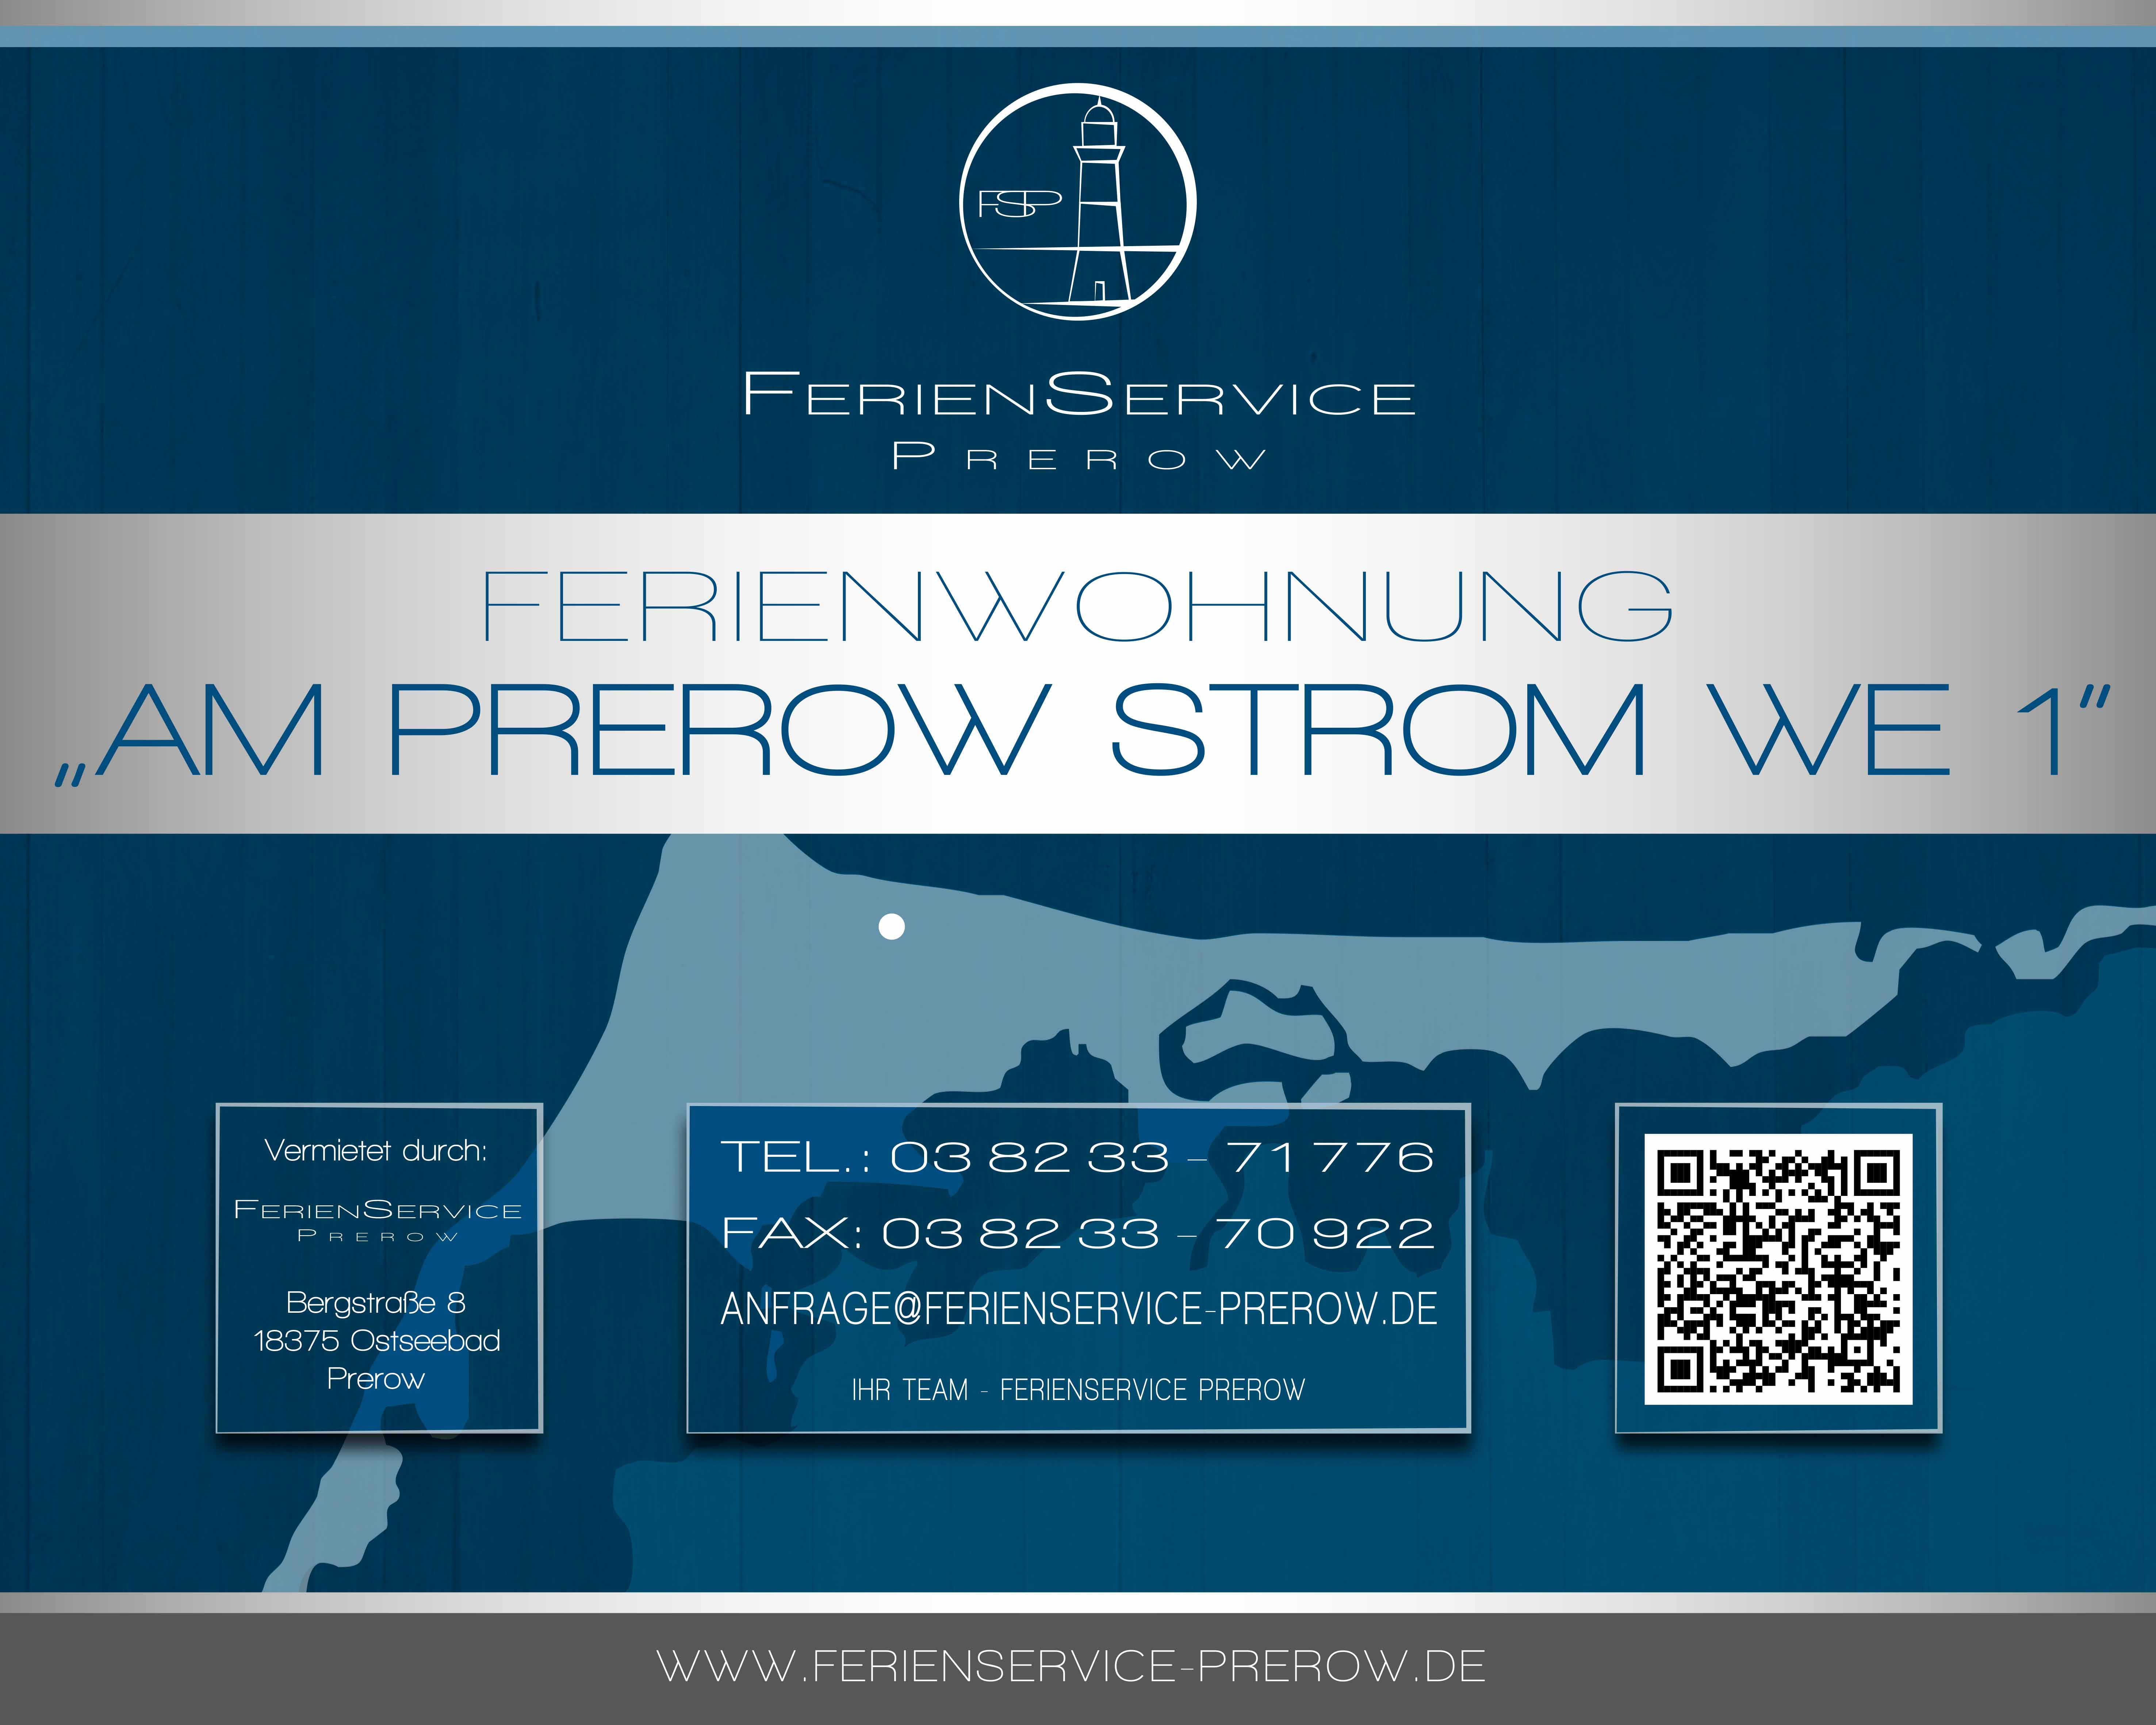 2 Prerow Ferienwohnung Am Prerowstrom - Ferienservice Prerow, Krabbenort 8 18375 Ostseebad Prerow